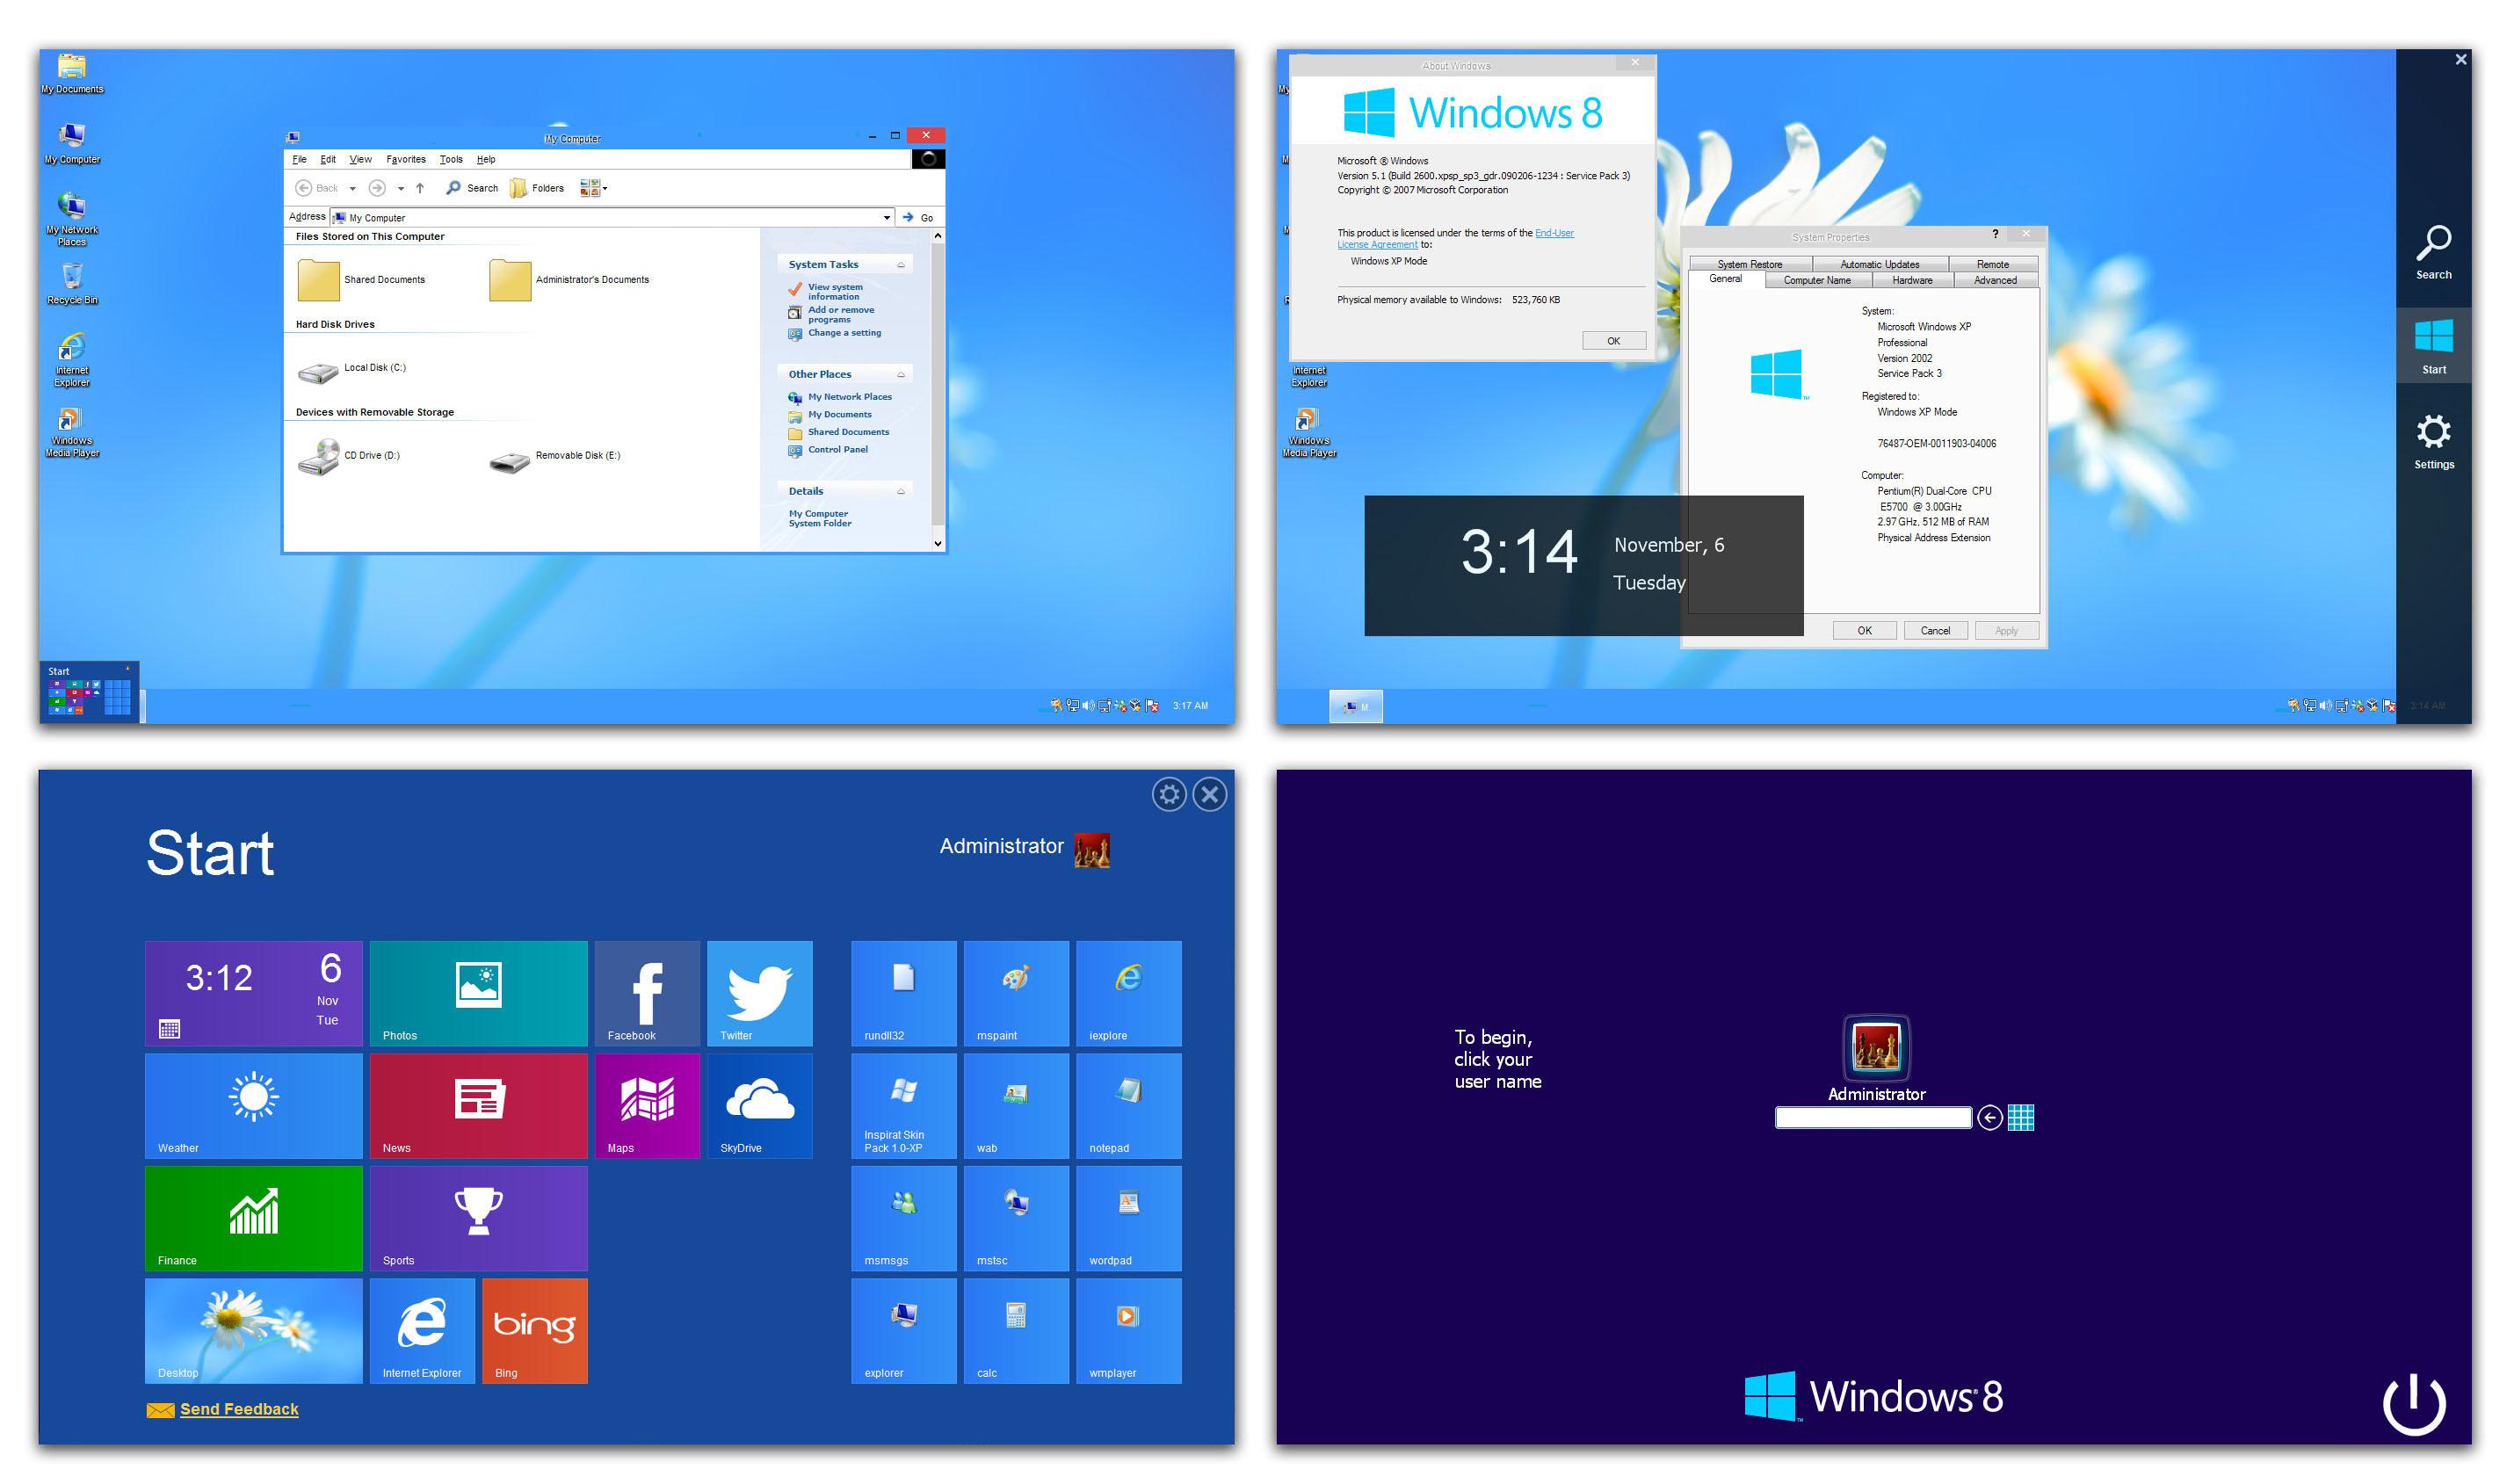 Windows 8 Skin Pack 9.0